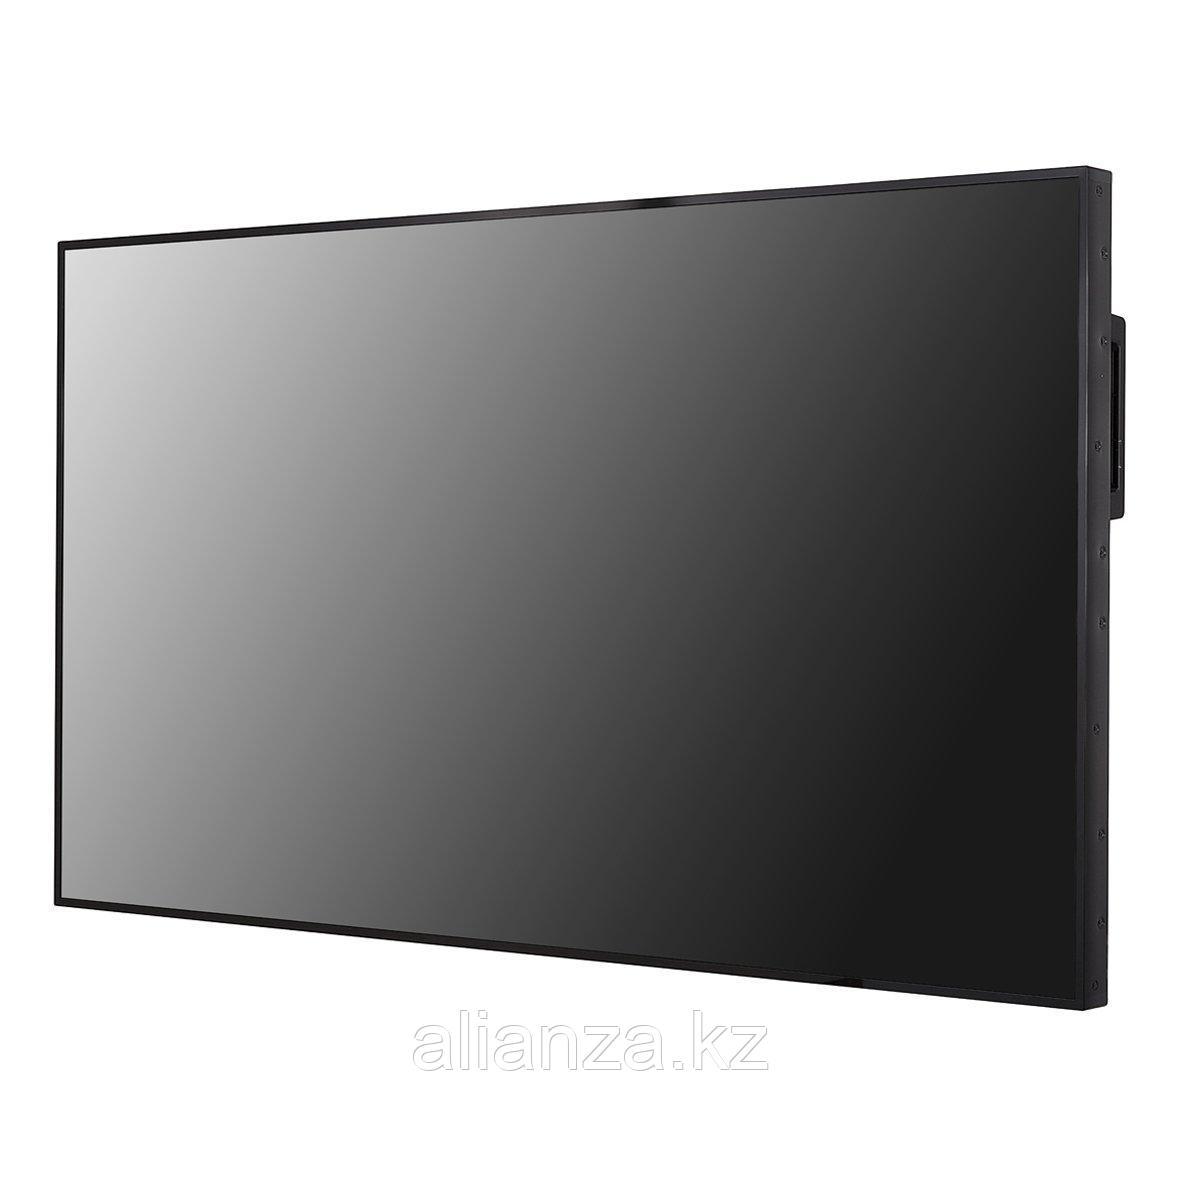 LED панель LG 75XF3C-B